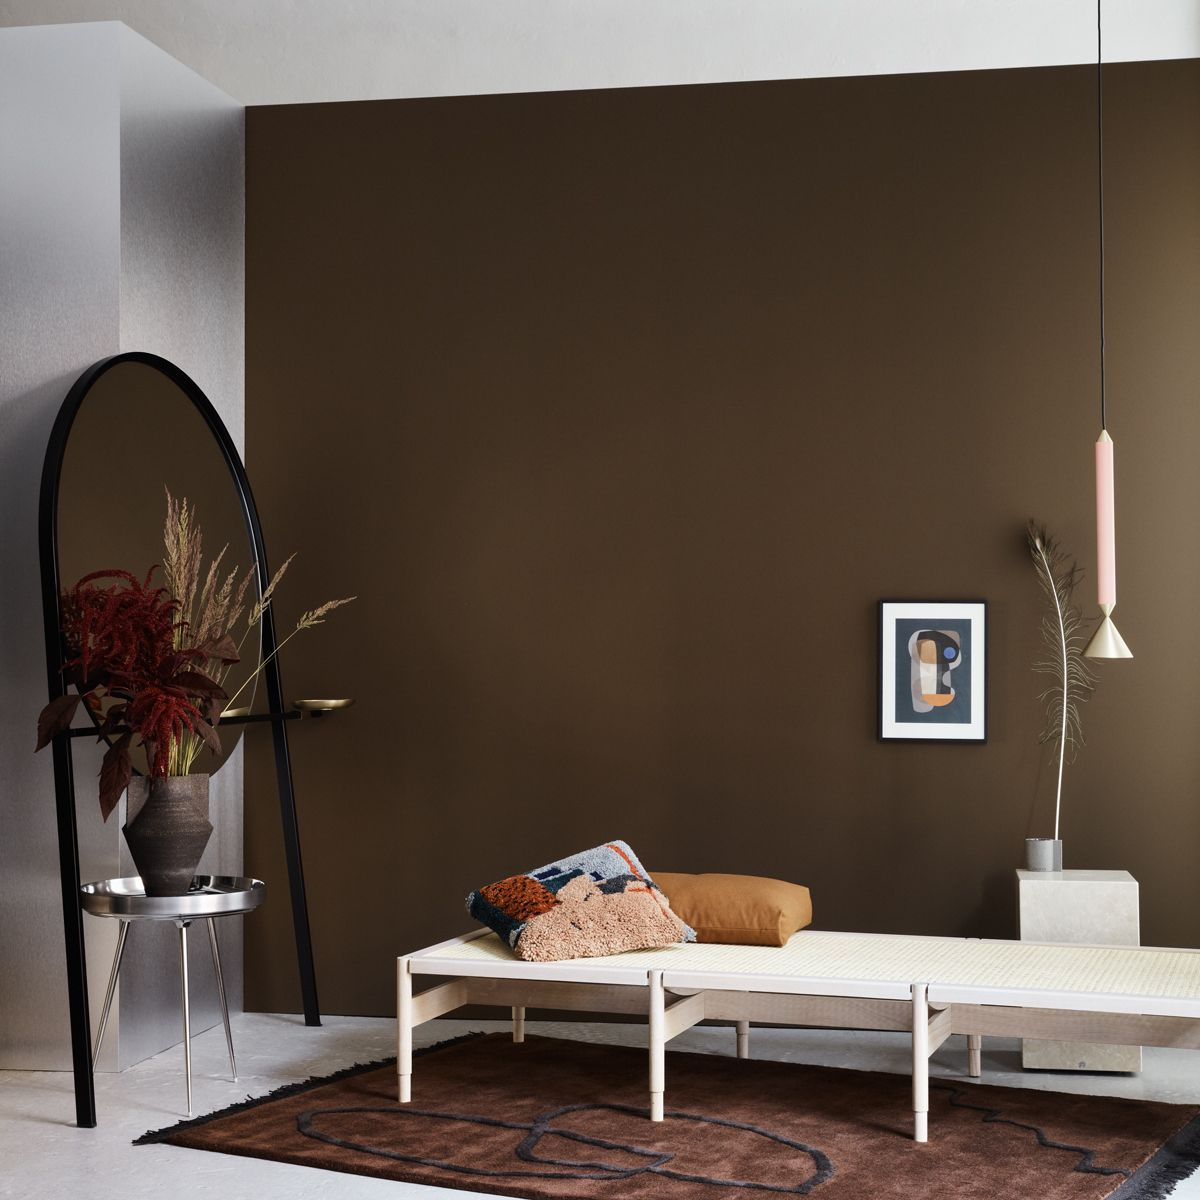 Farbe Schlamm Wandfarbe Braun Wandfarbe Taupe Zimmer